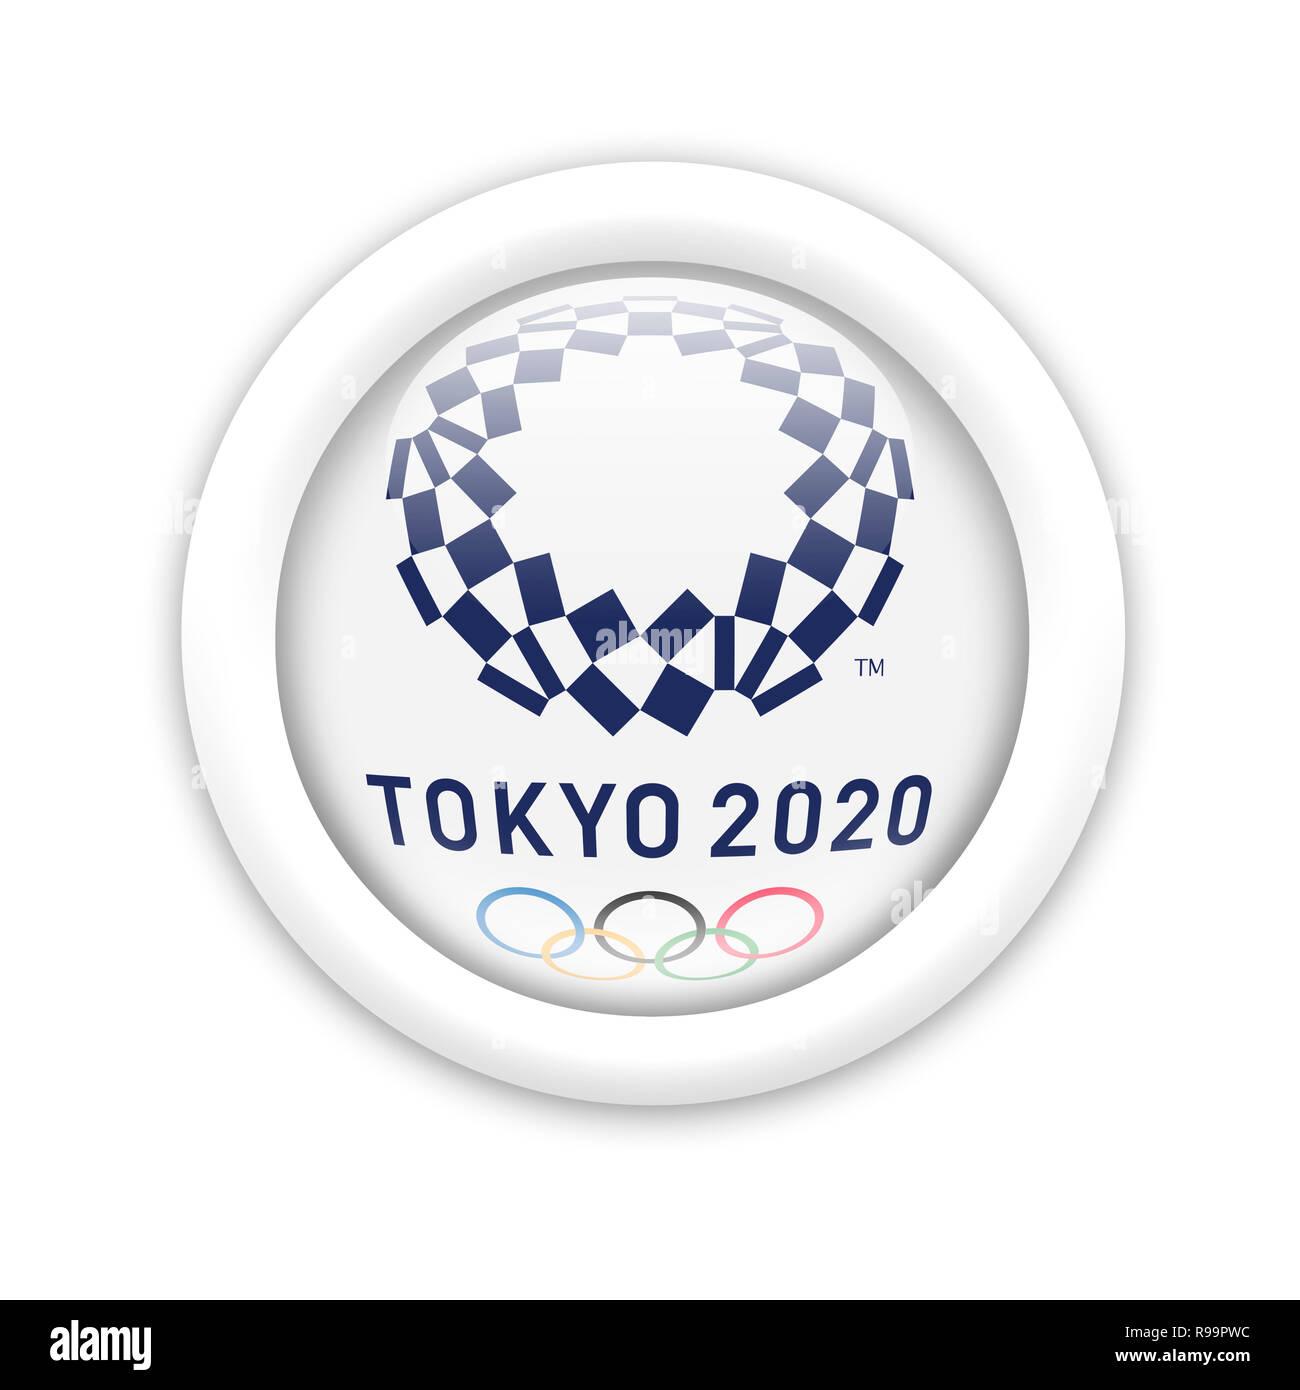 2020 Tokyo Olympic Imagenes De Stock 2020 Tokyo Olympic Fotos De